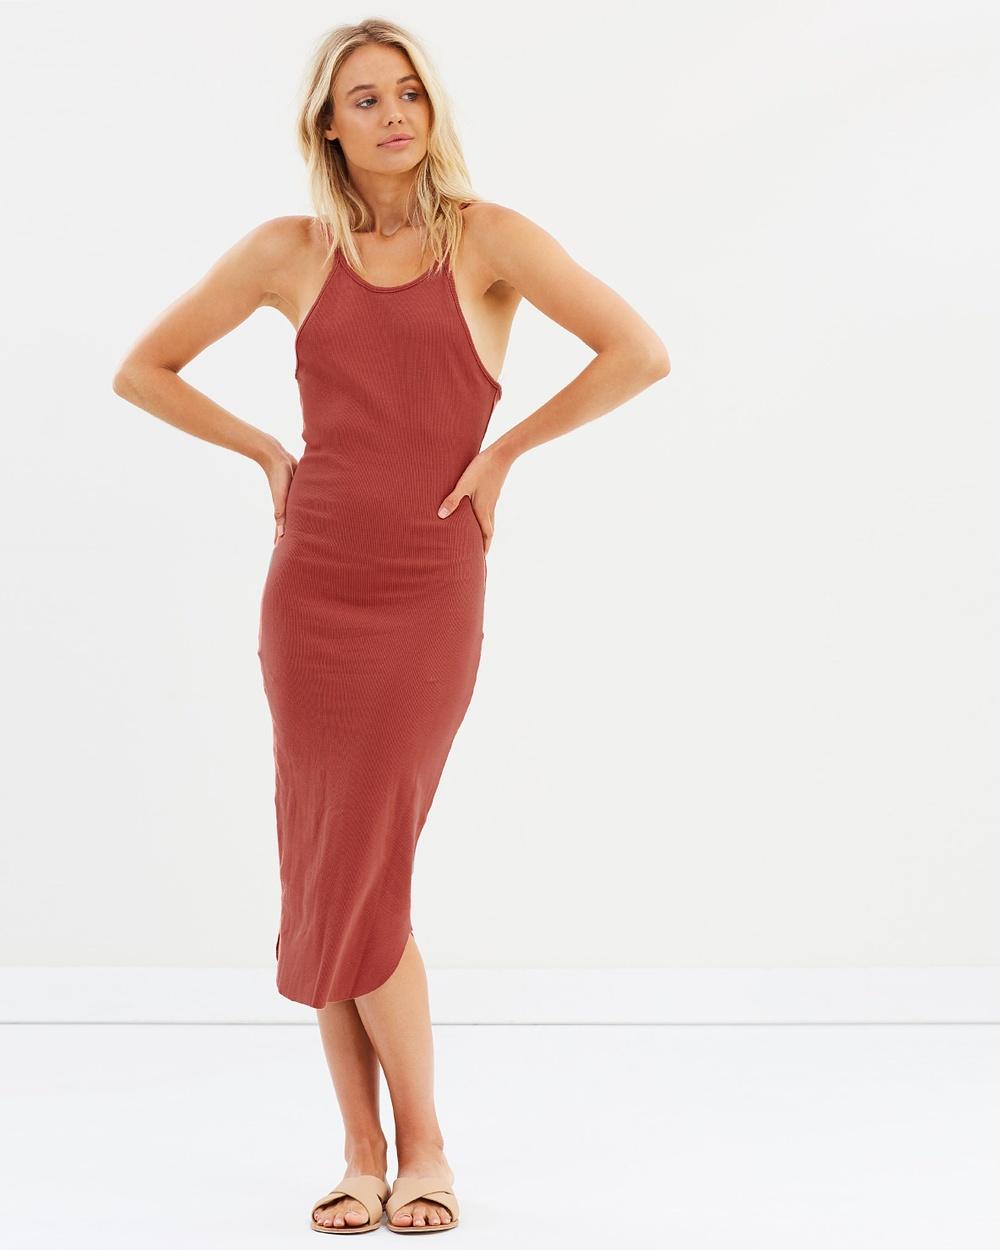 Nude Lucy Presley Rib Dress Dresses Rust Presley Rib Dress